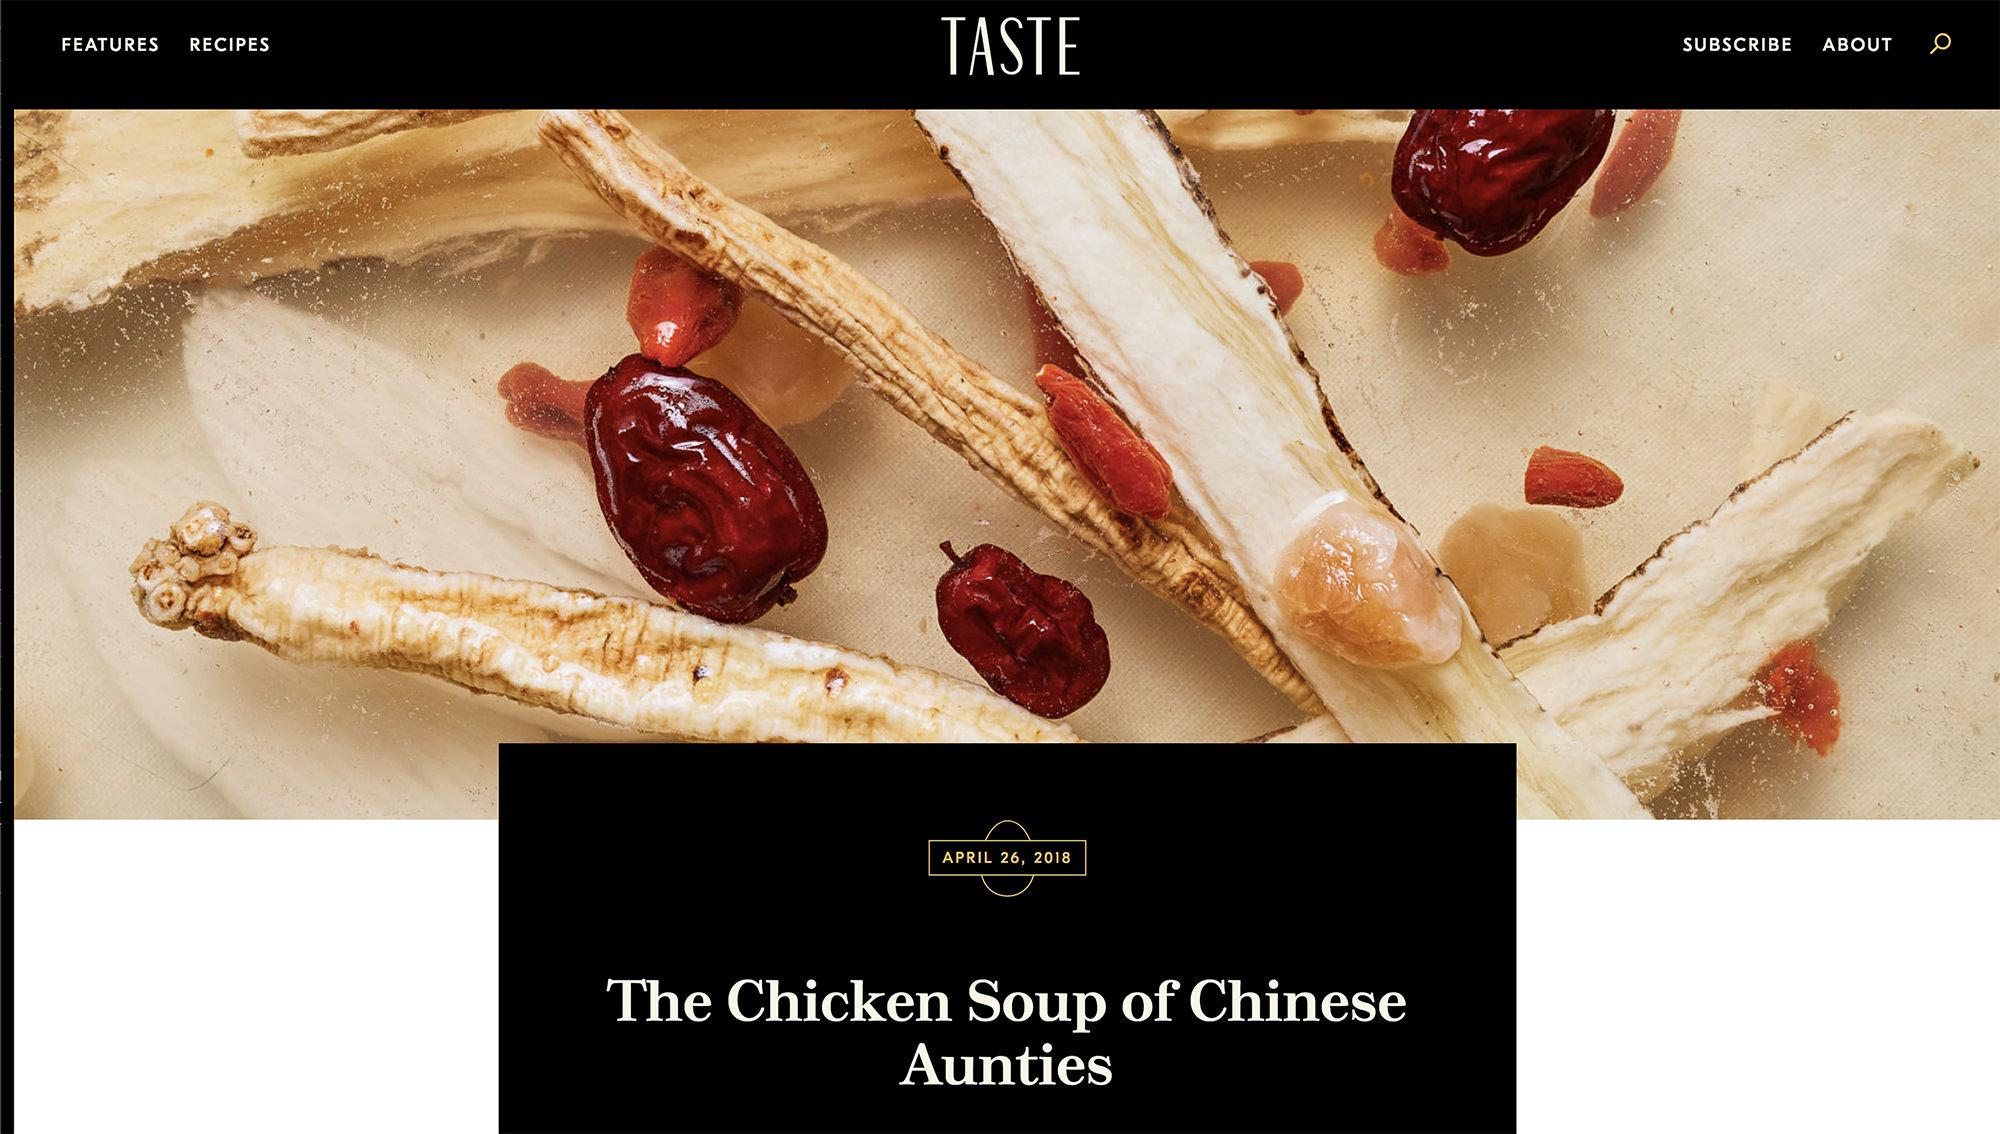 TasteMag_ChickenSoup.jpg